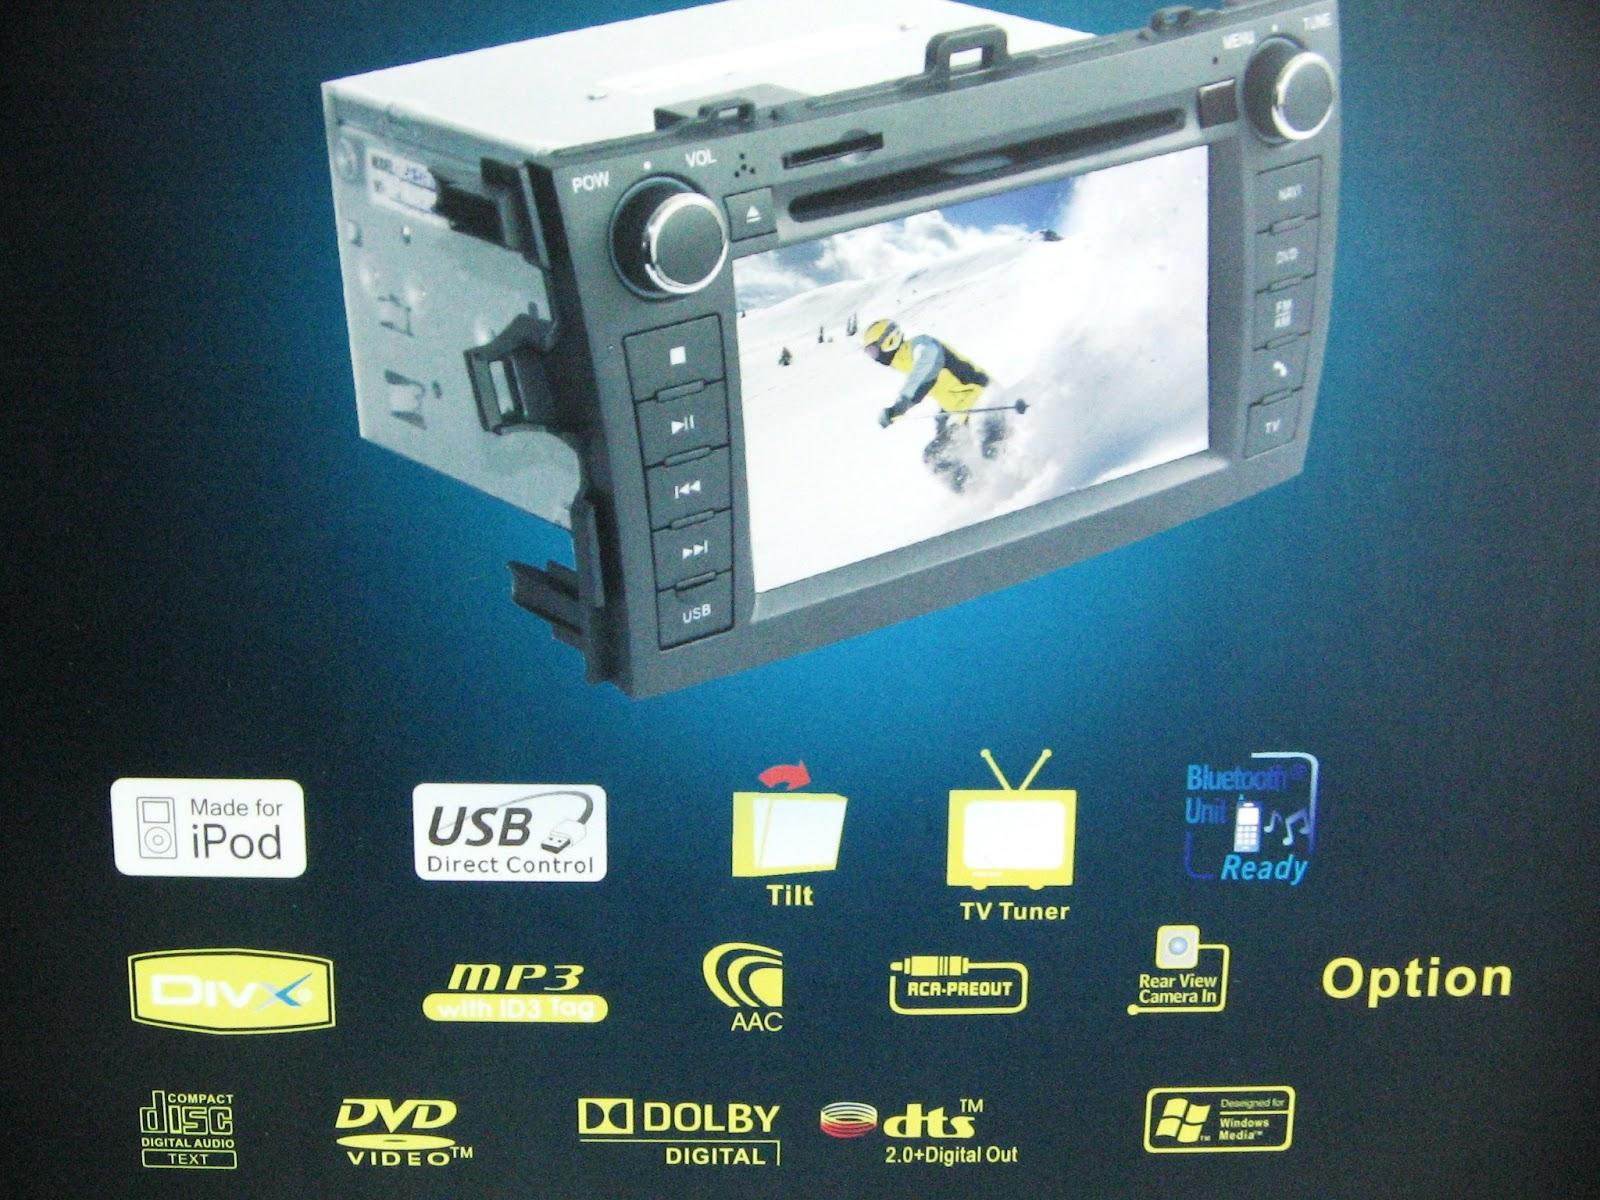 Car Digital Monitor Accessories Malaysia Toyota Lucida Fuse Box English Posted 26th December 2012 By Seetha Raman